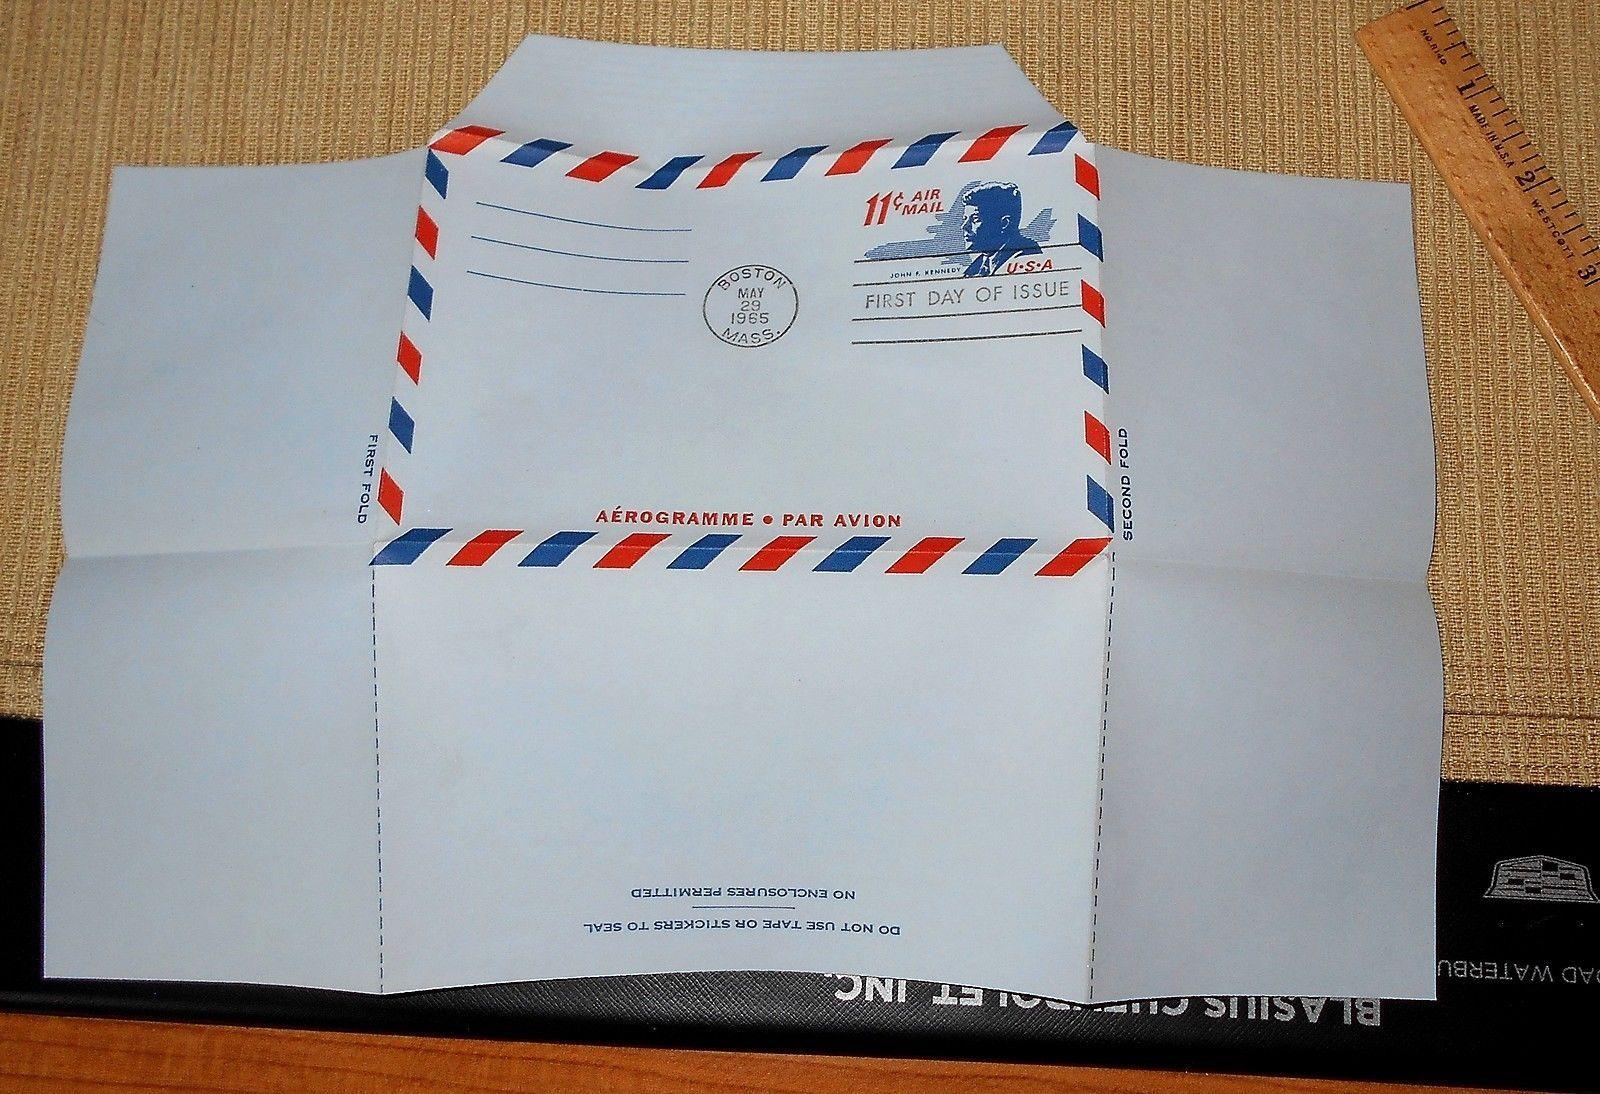 1965 11c John F. Kennedy Air Letter Sheet Postal Stationery FDC, No Writing